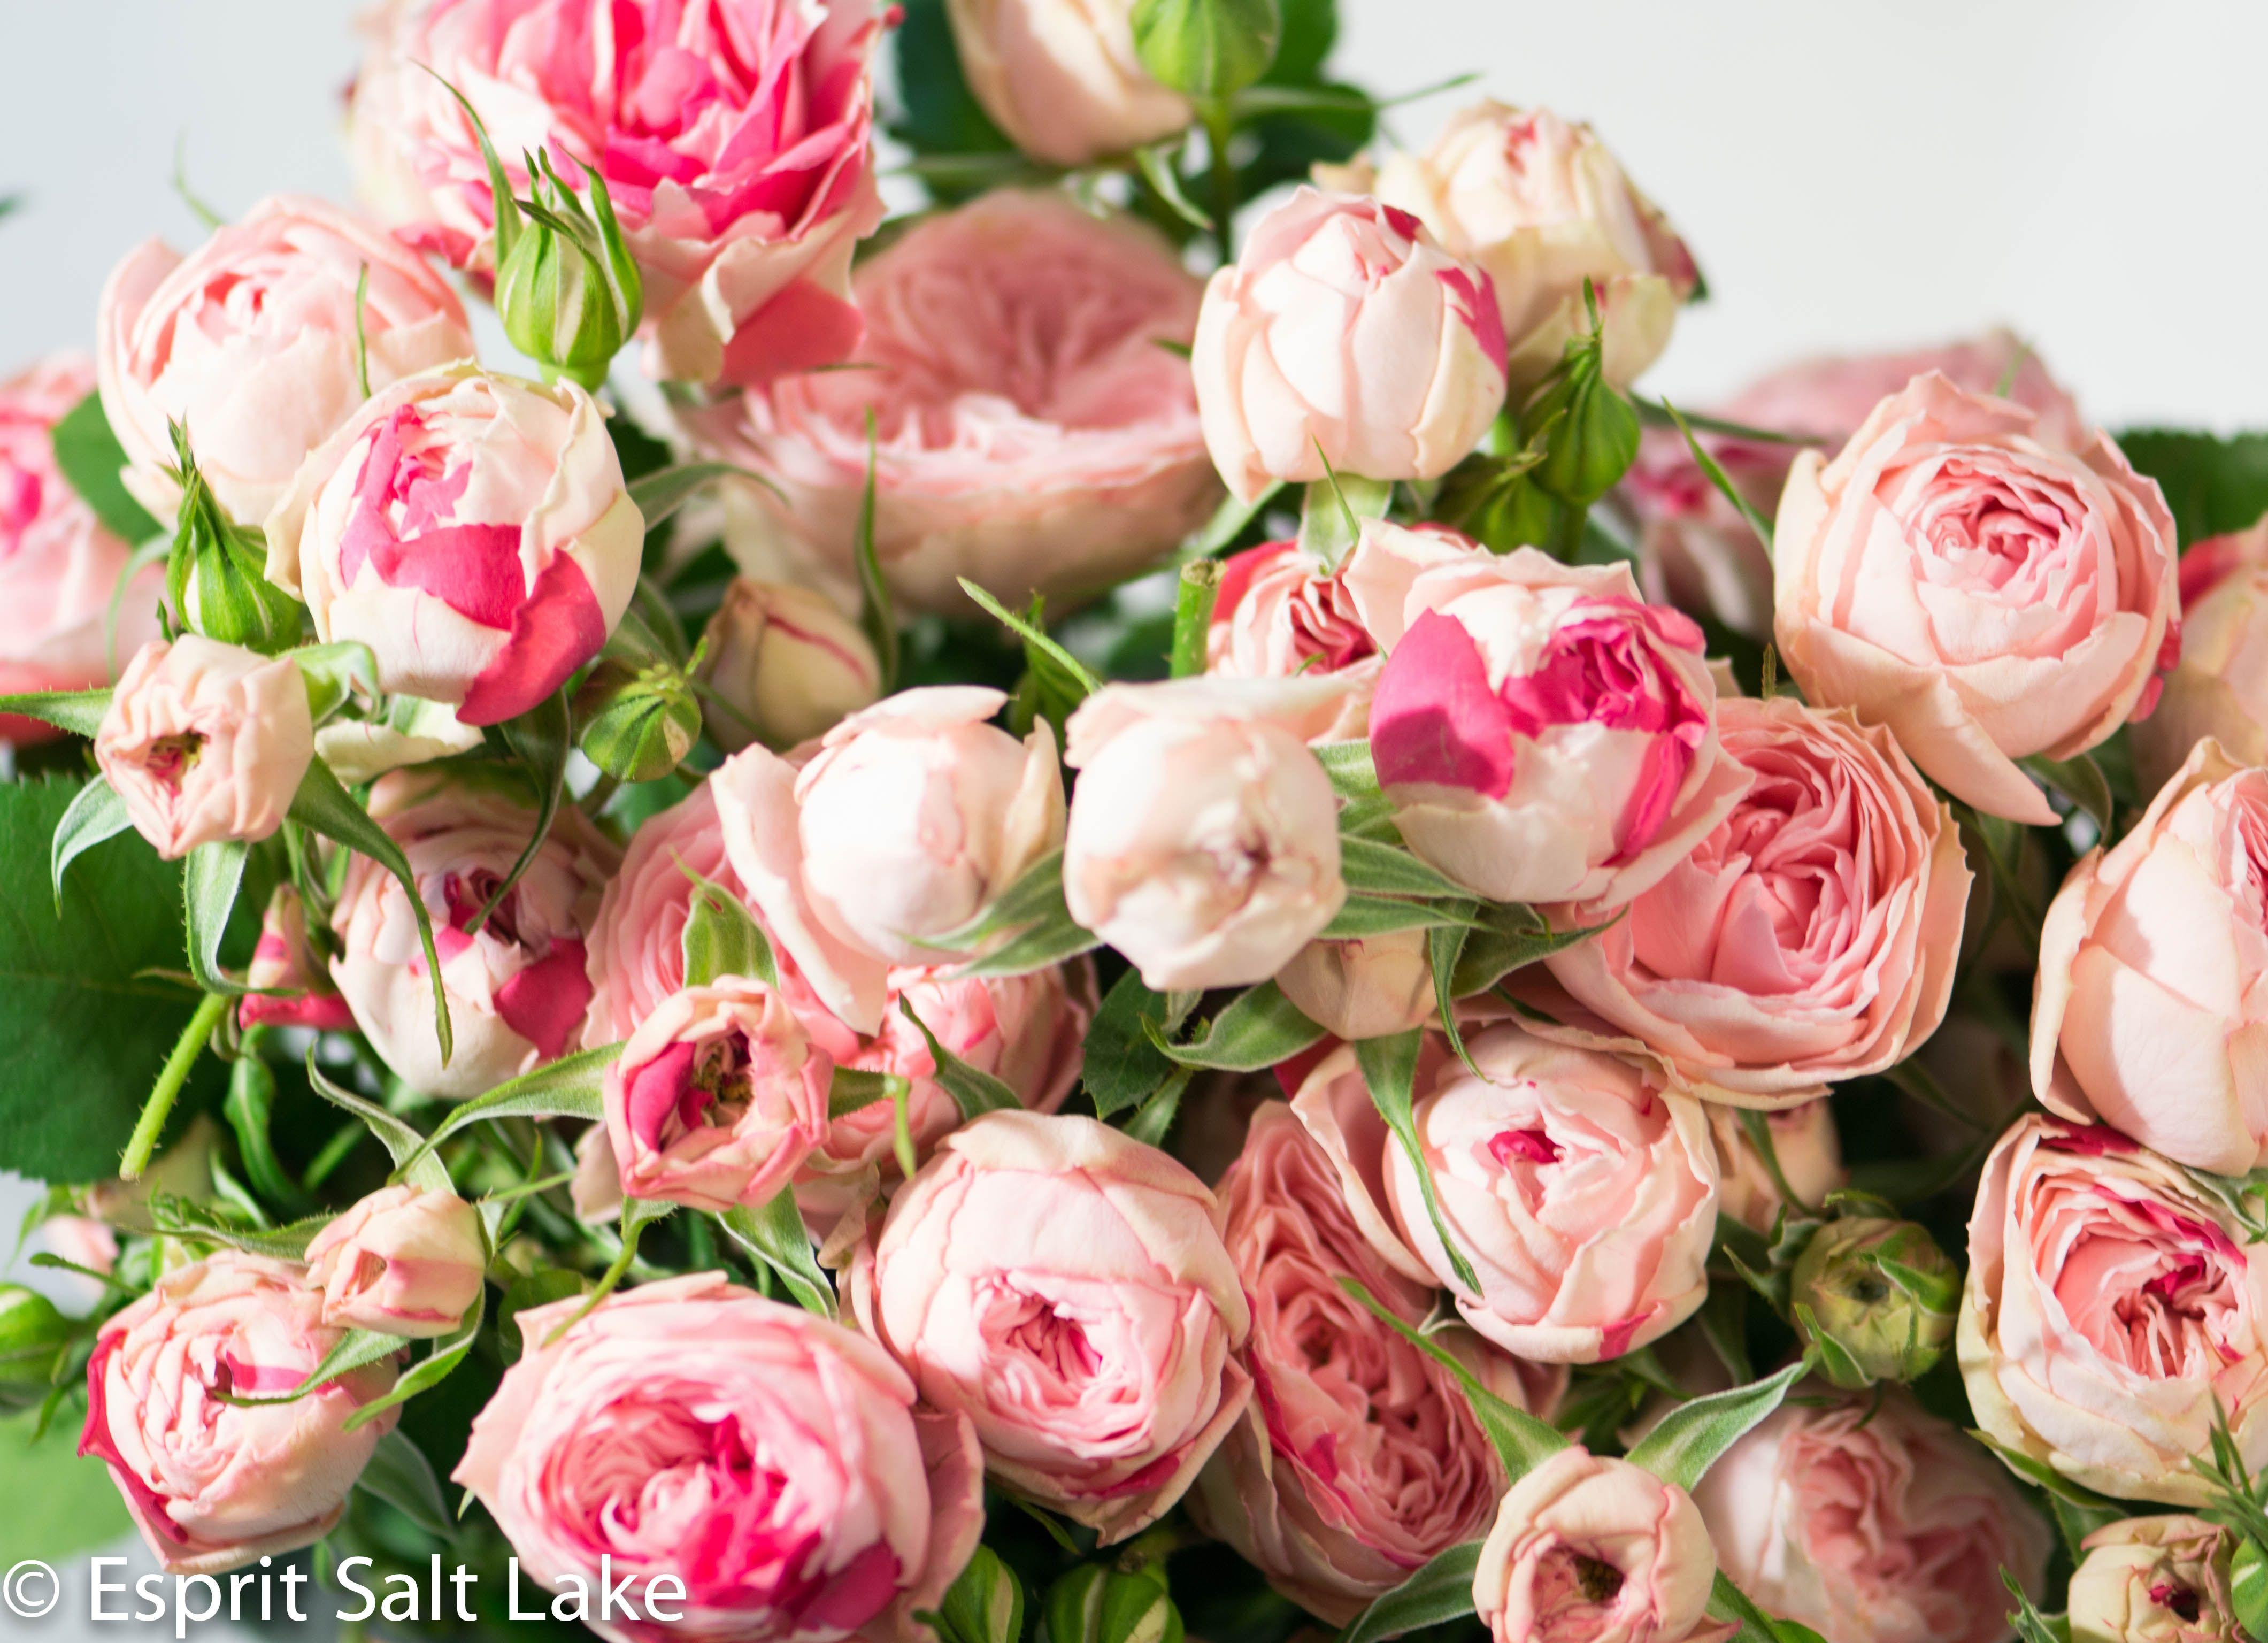 Speckled Opal Gem garden spray rose pink Spray roses